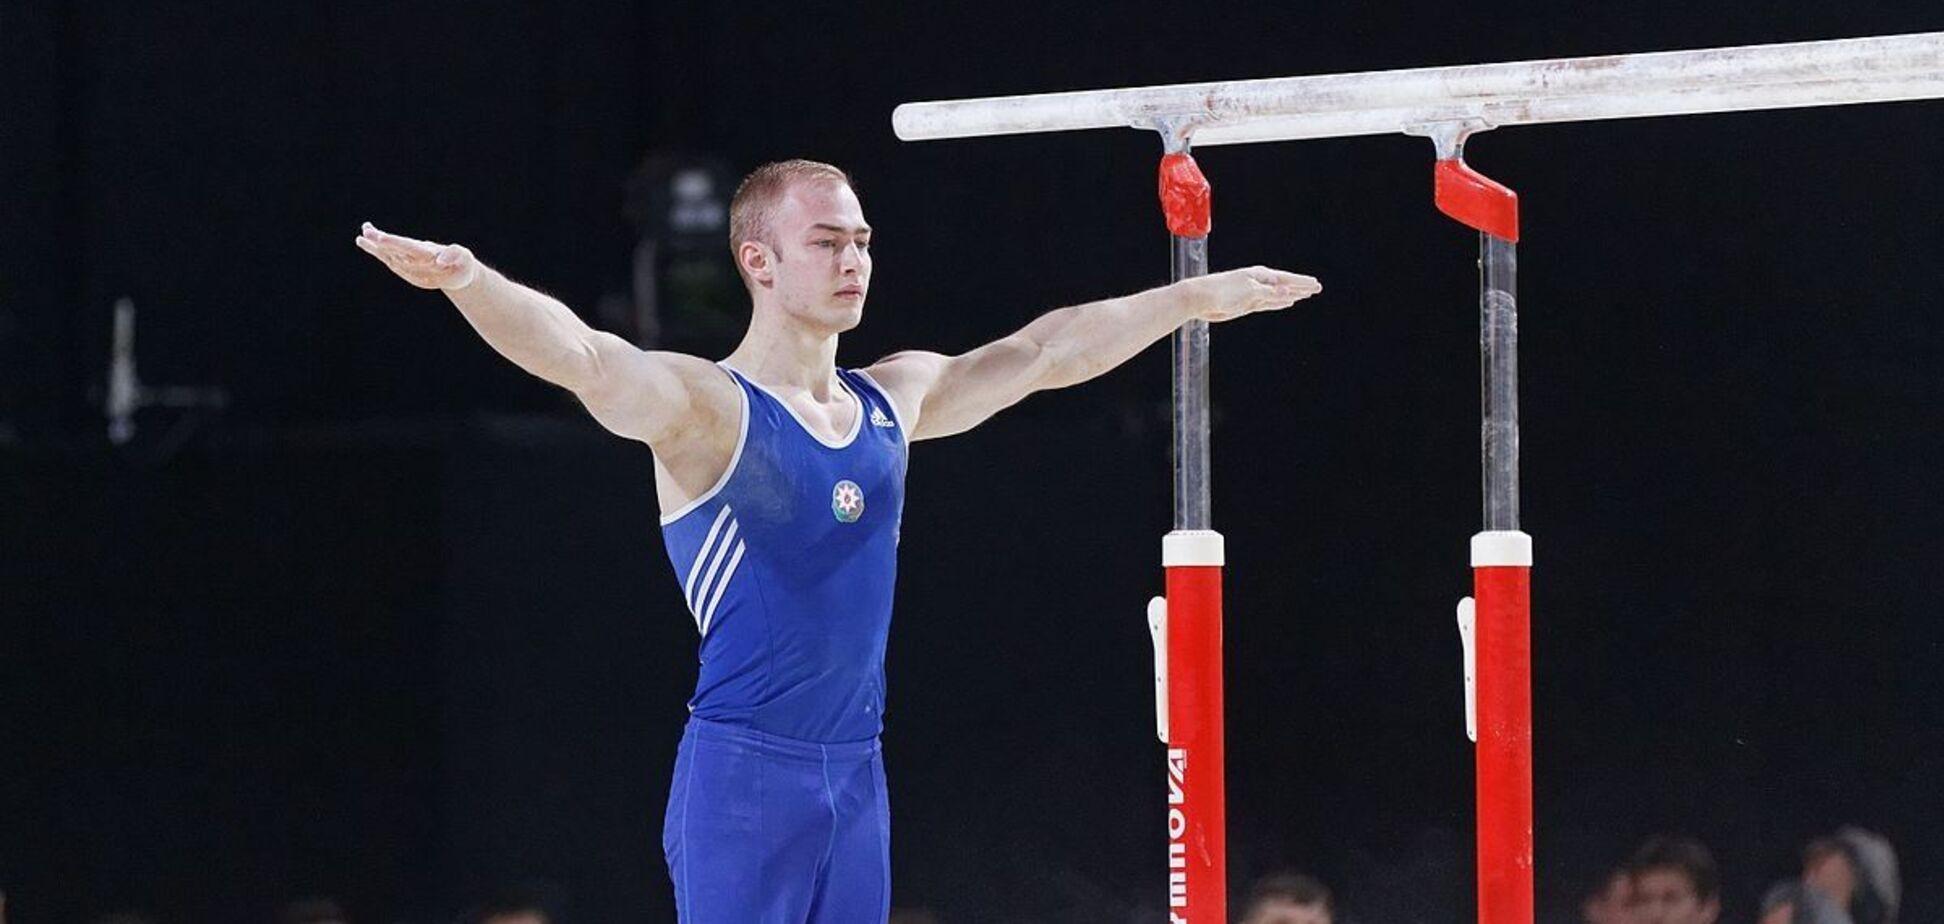 Петр Пахнюк